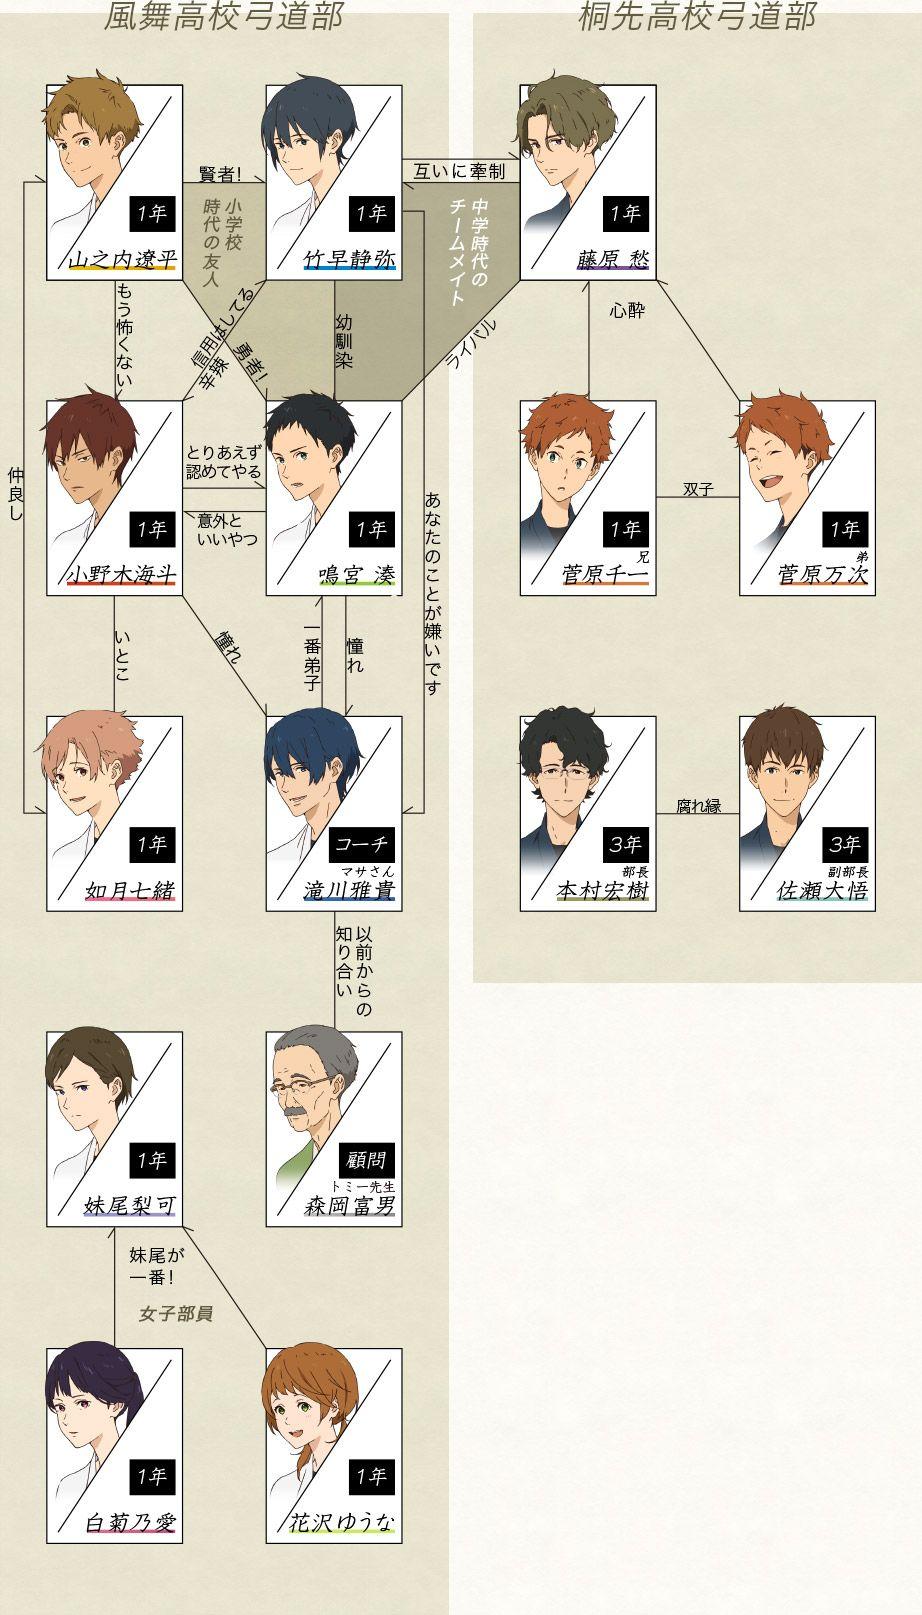 ツルネ 風舞高校弓道部 公式 on twitter in 2021 cute anime guys sports anime anime